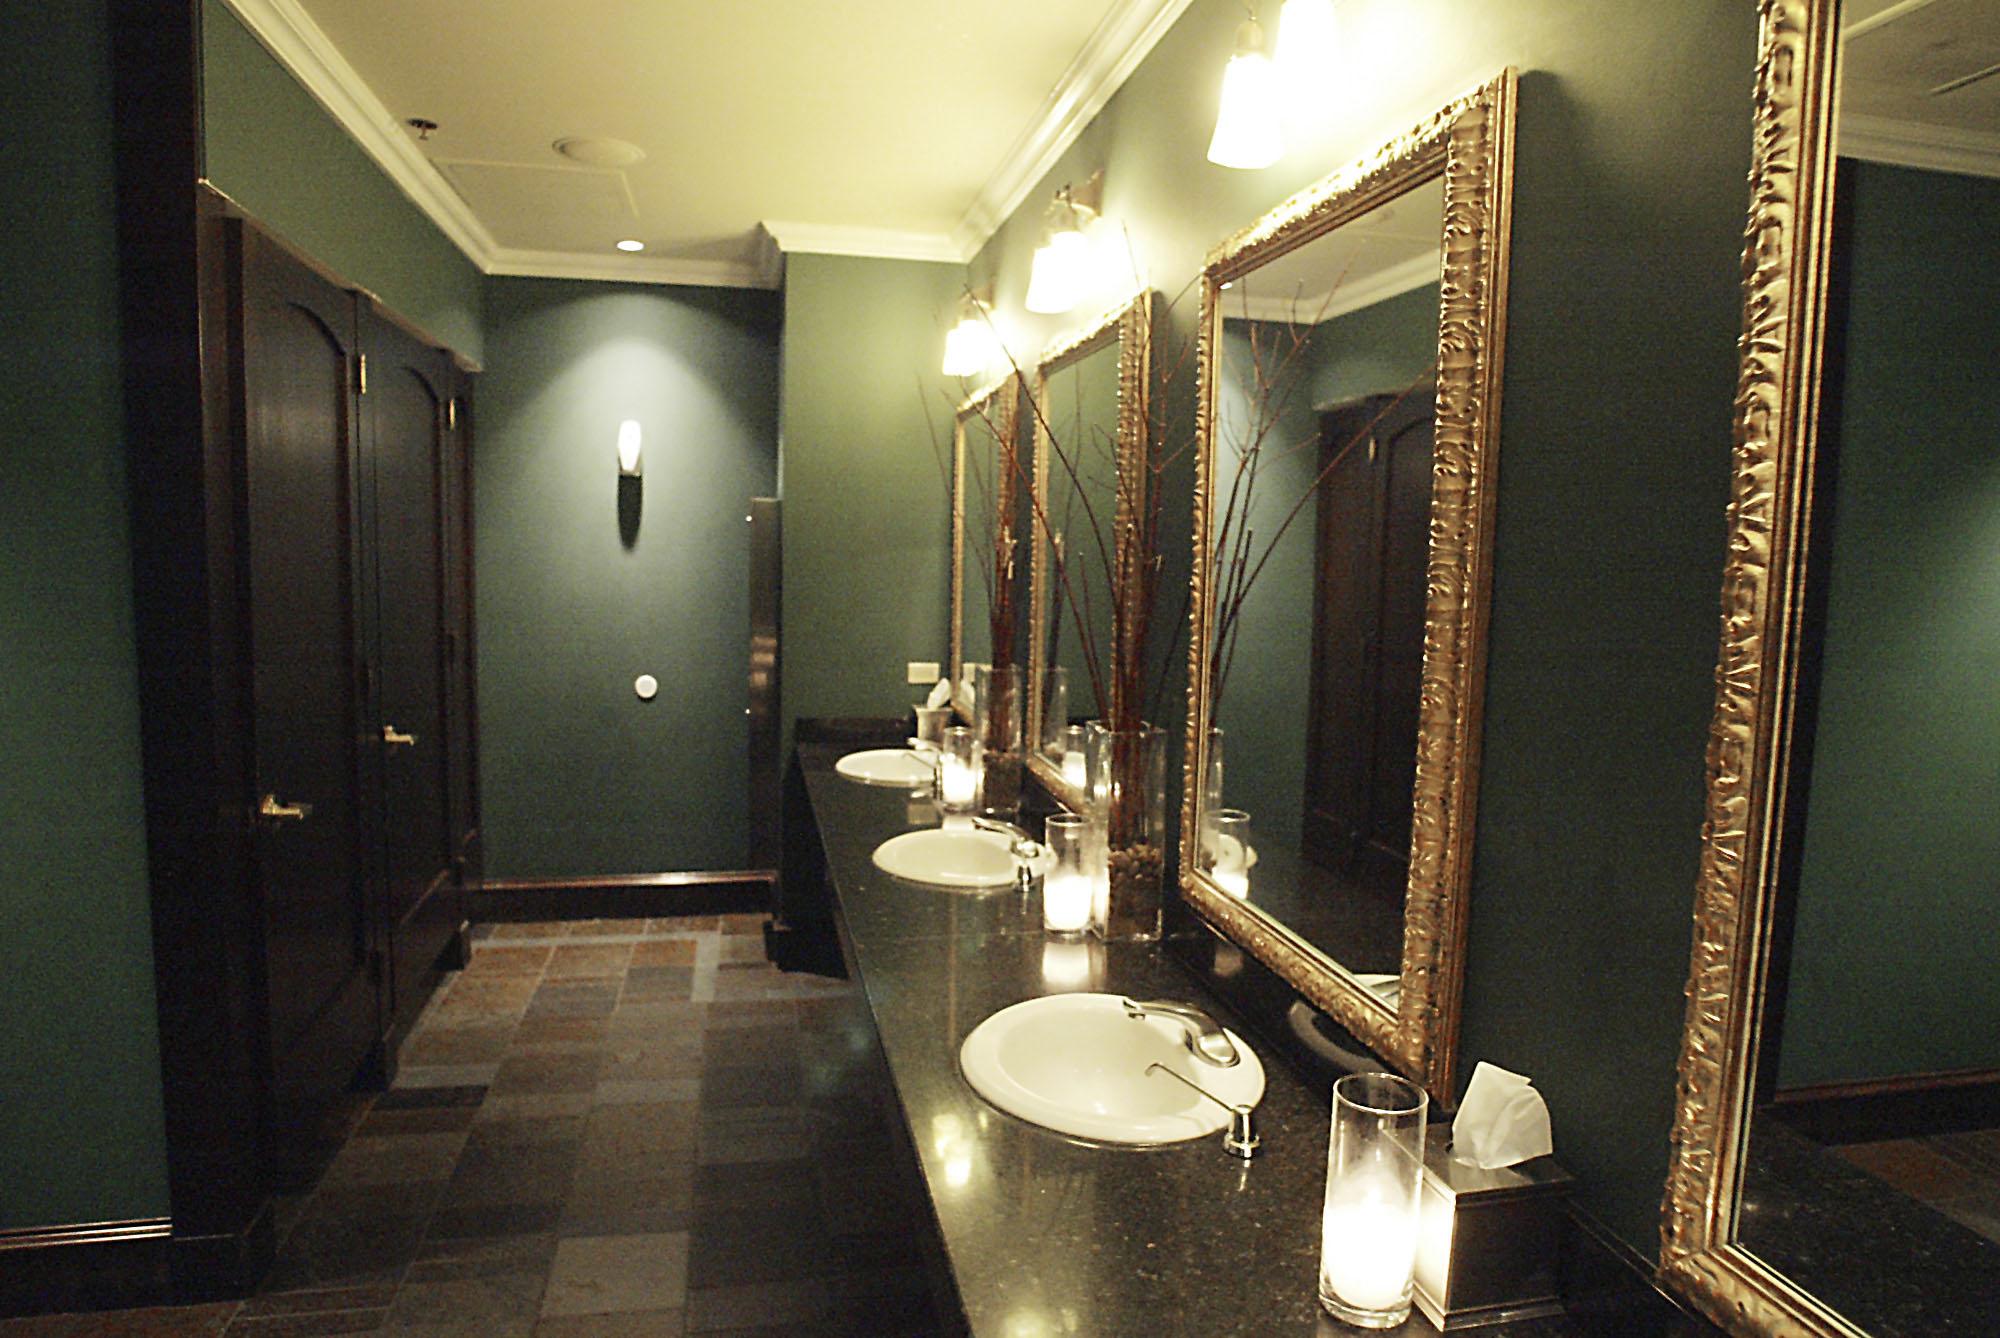 Experts suggest best restrooms las vegas review journal for Best bathrooms vegas